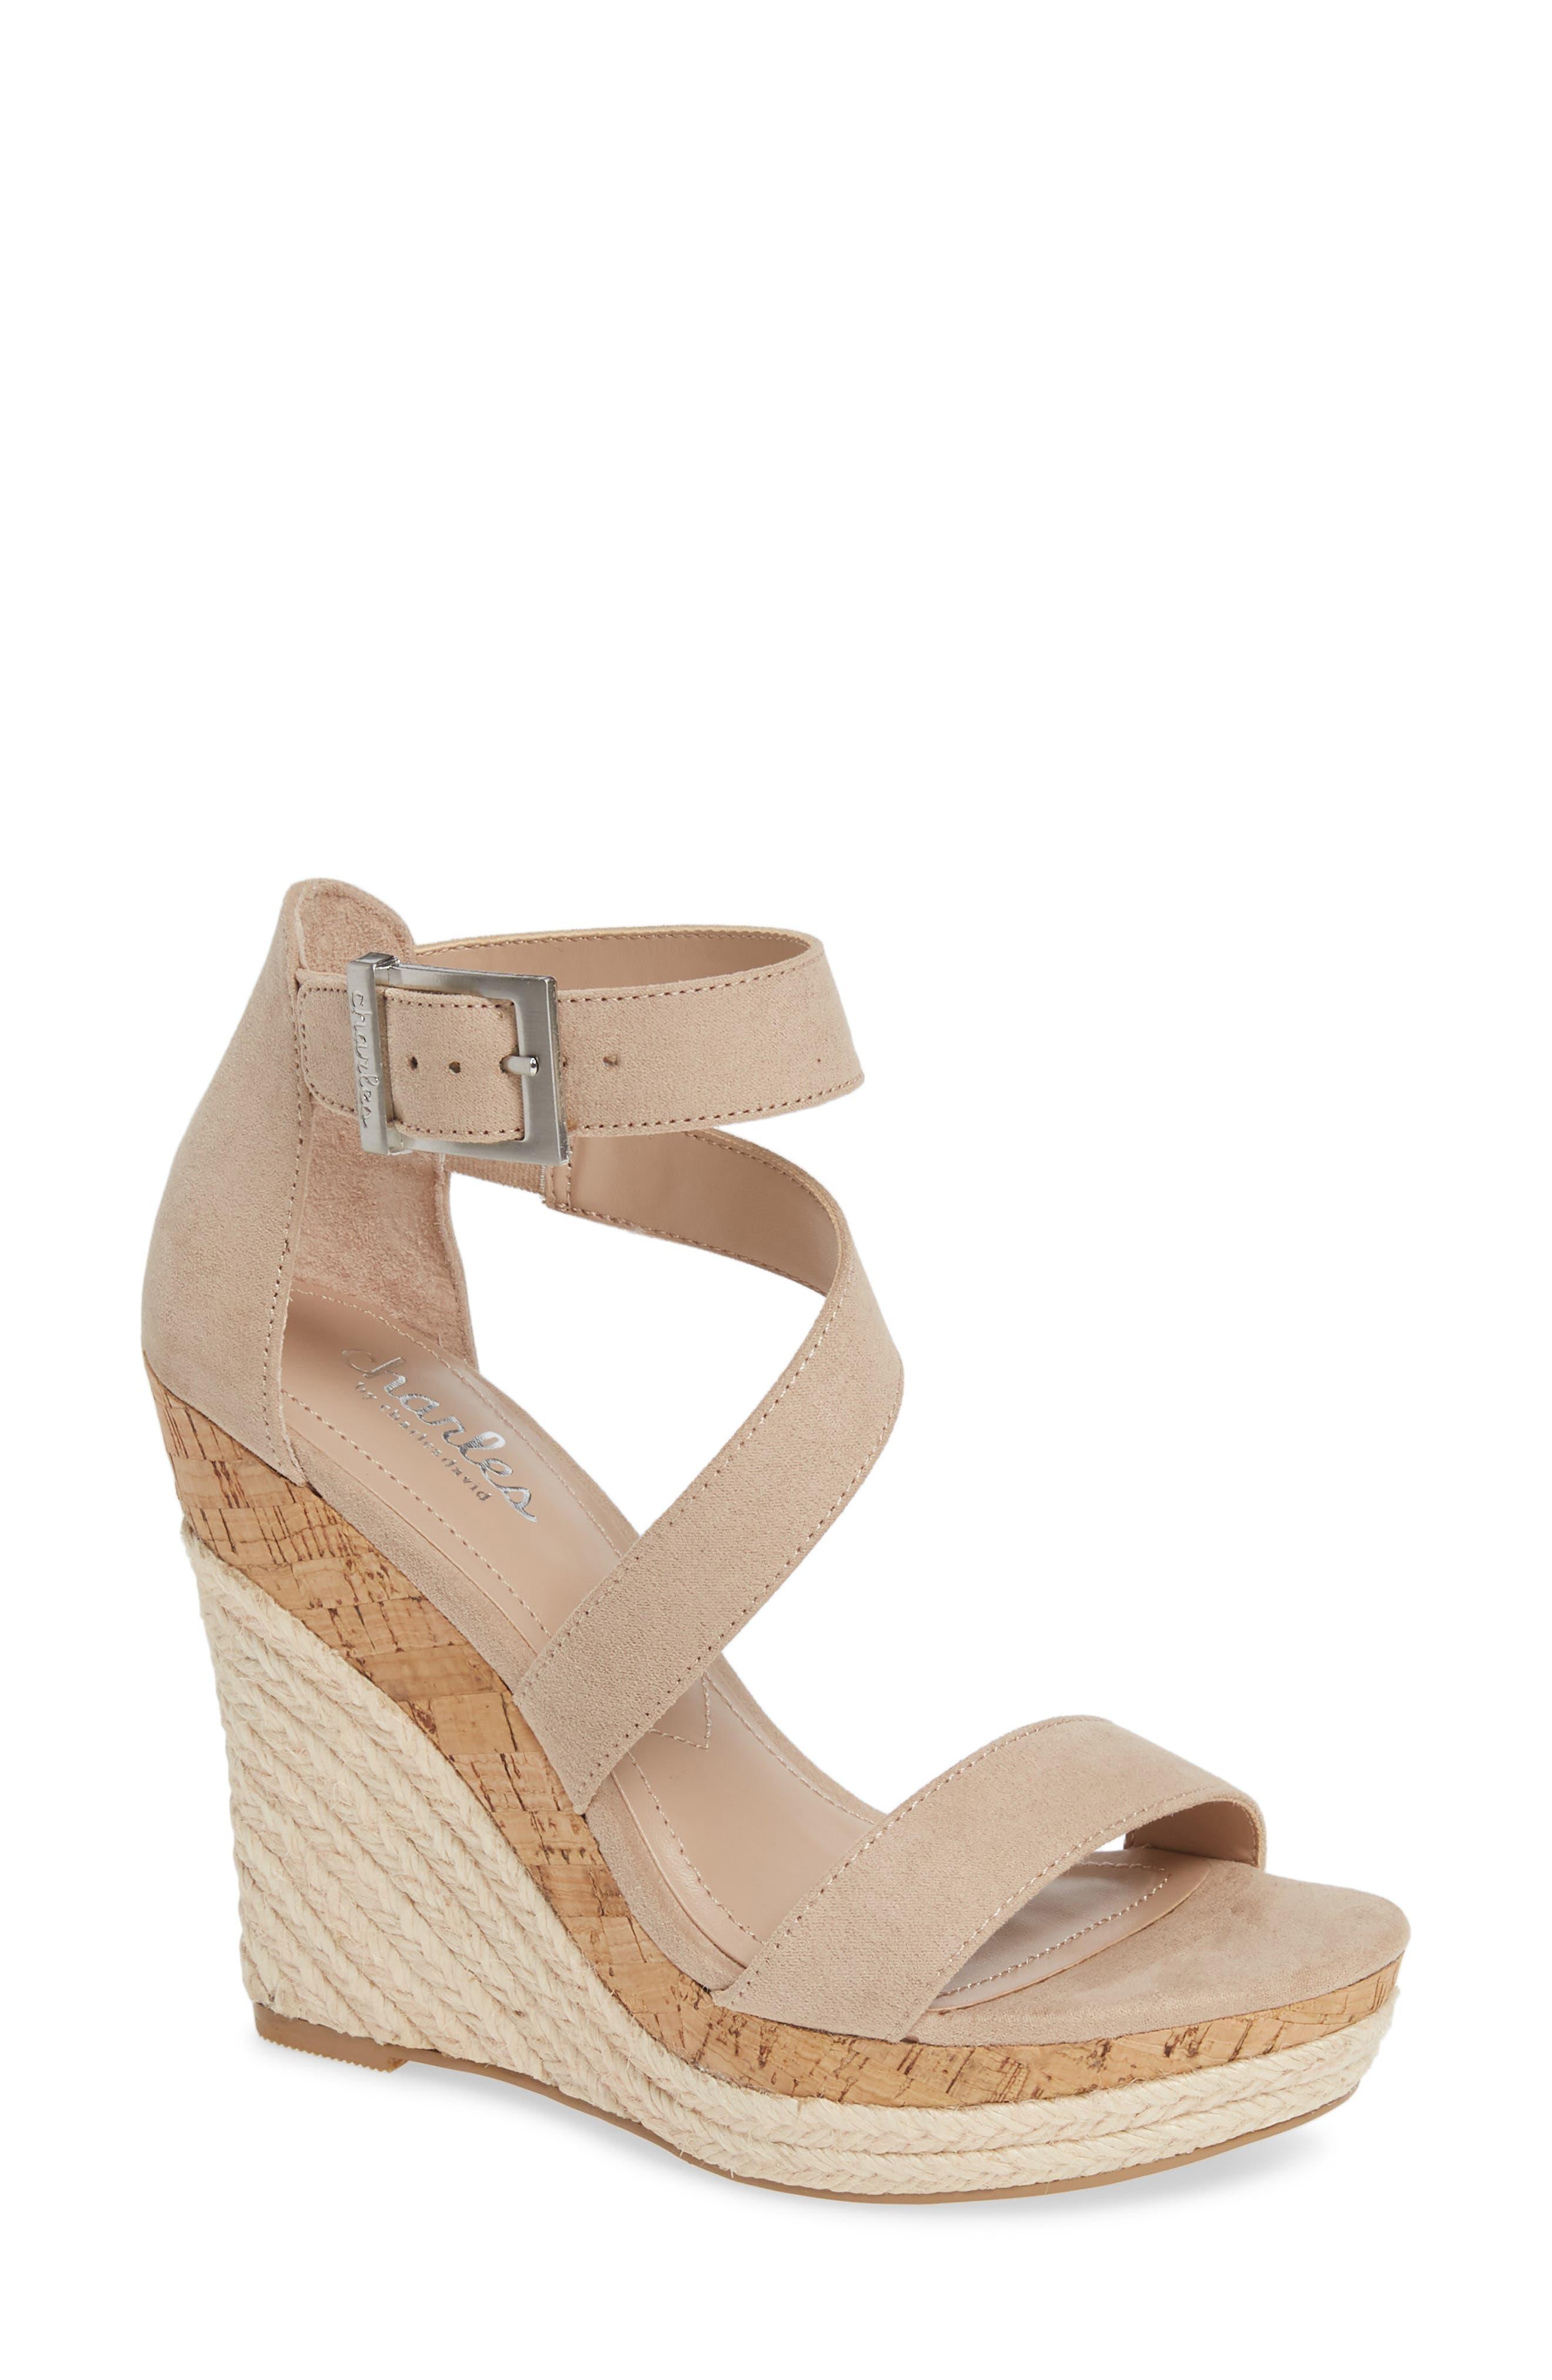 Charles By Charles David Adrielle Asymmetrical Platform Wedge Sandal, Beige